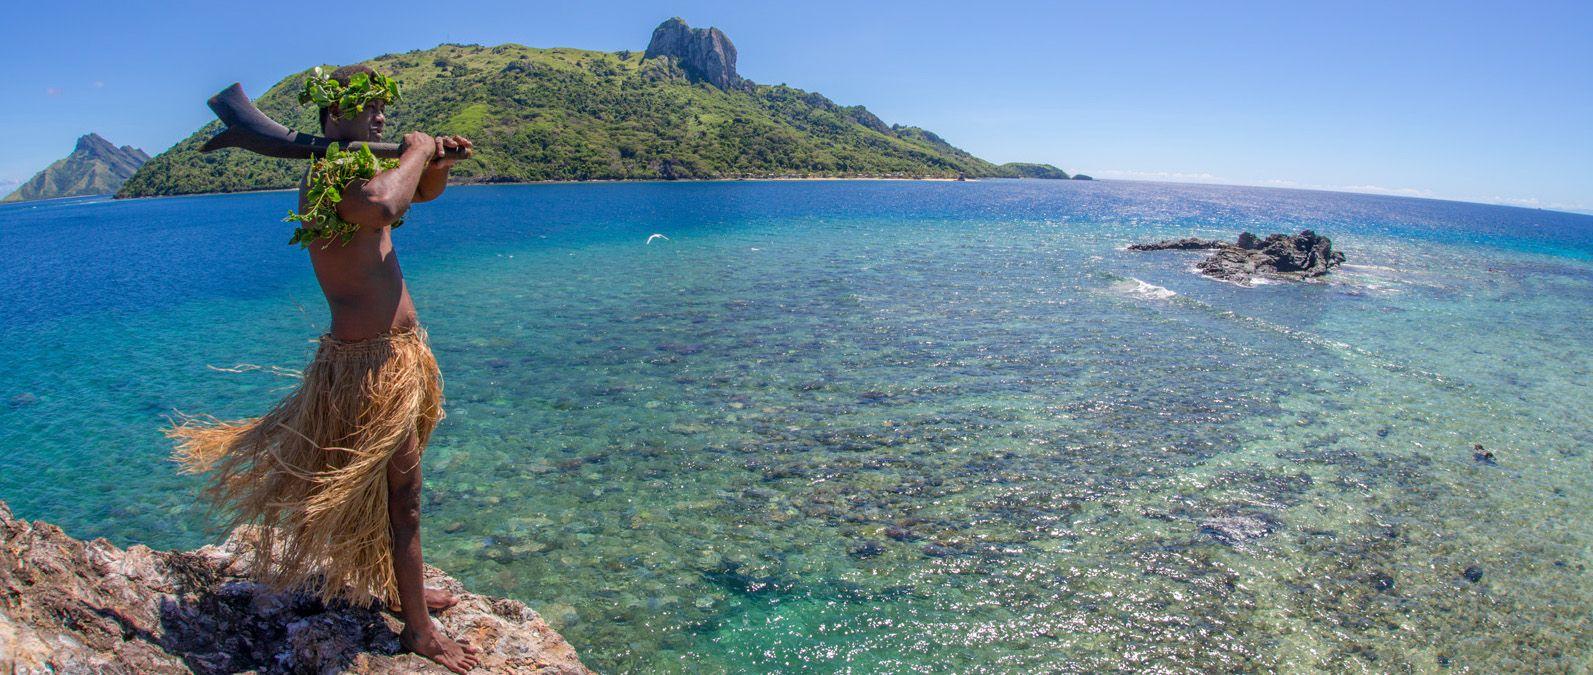 Barefoot Manta Island Fiji Drawaqa The Ultimate Guide To The